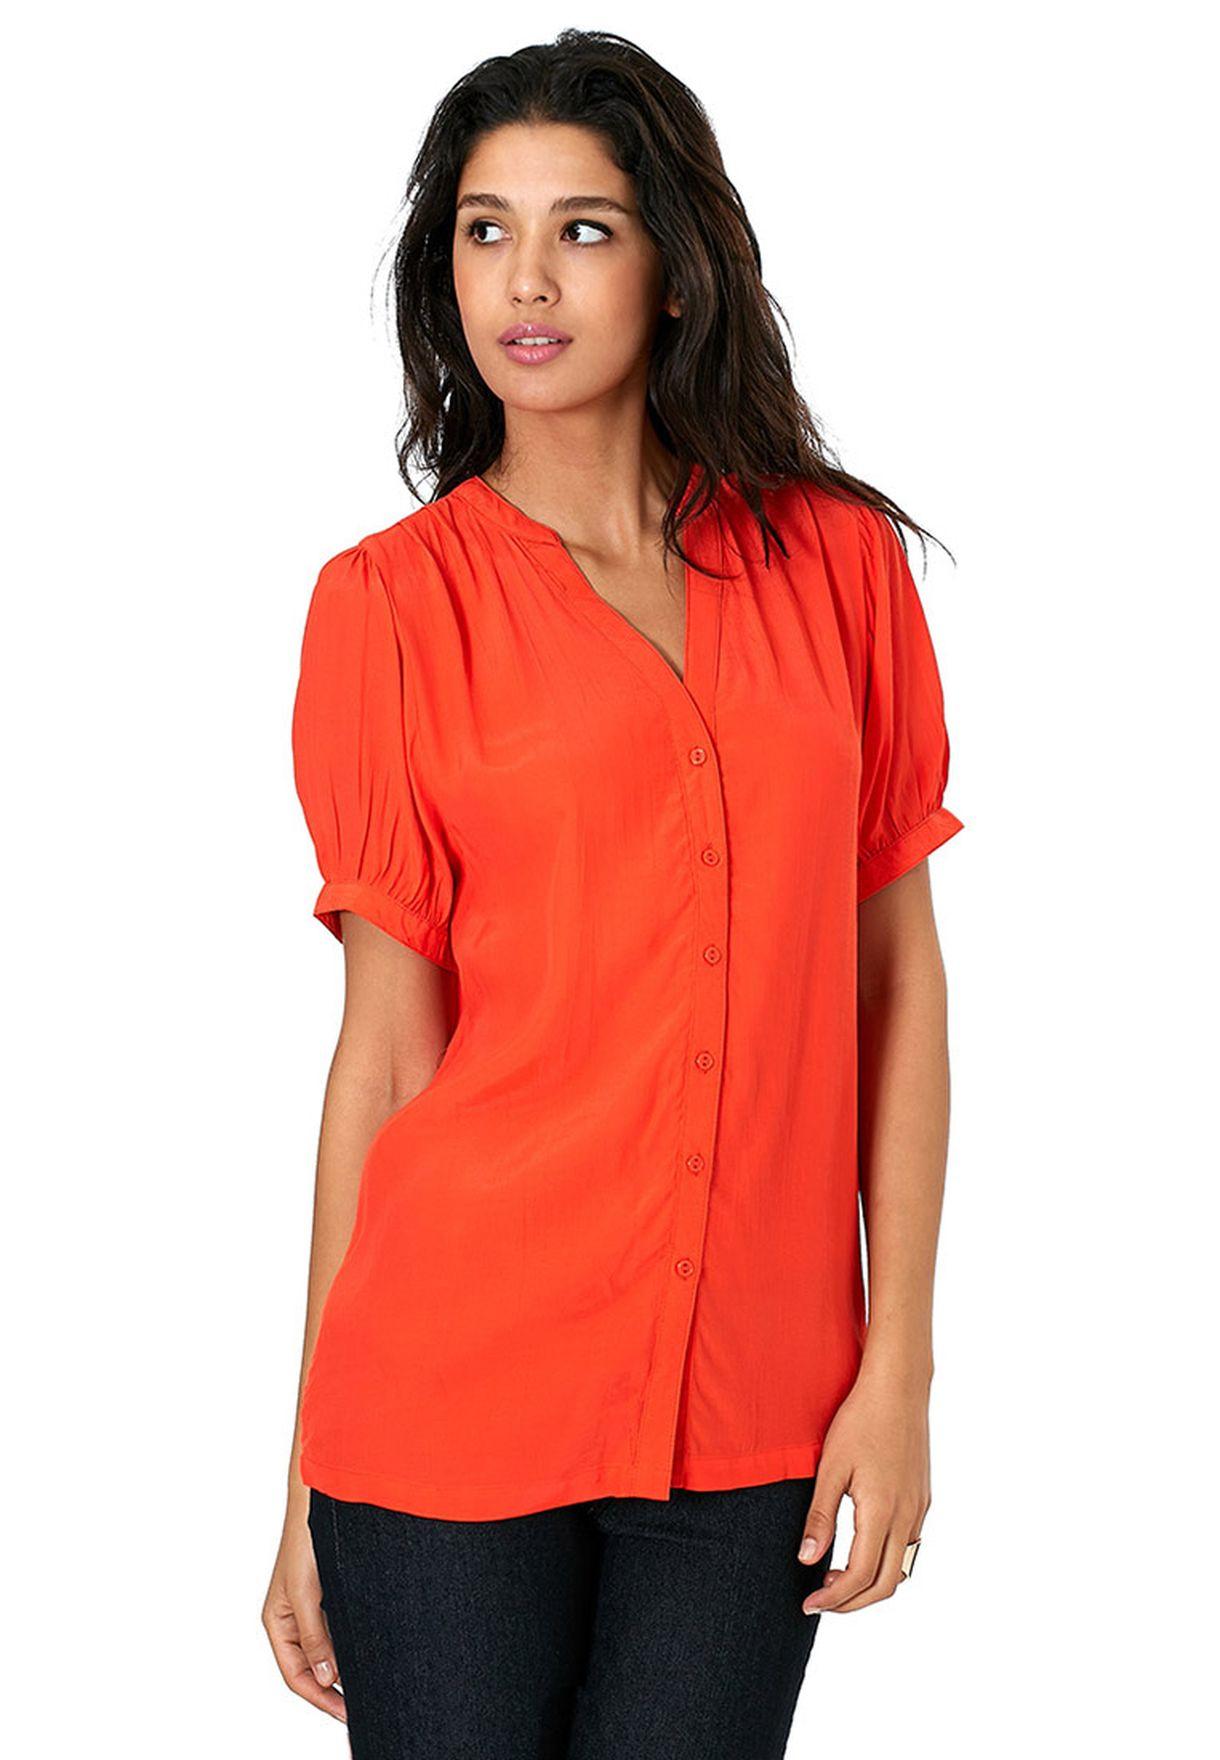 52355ffce59e87 Shop Ichi orange Short Sleeve Tunic for Women in Qatar - IC341AT30RPL